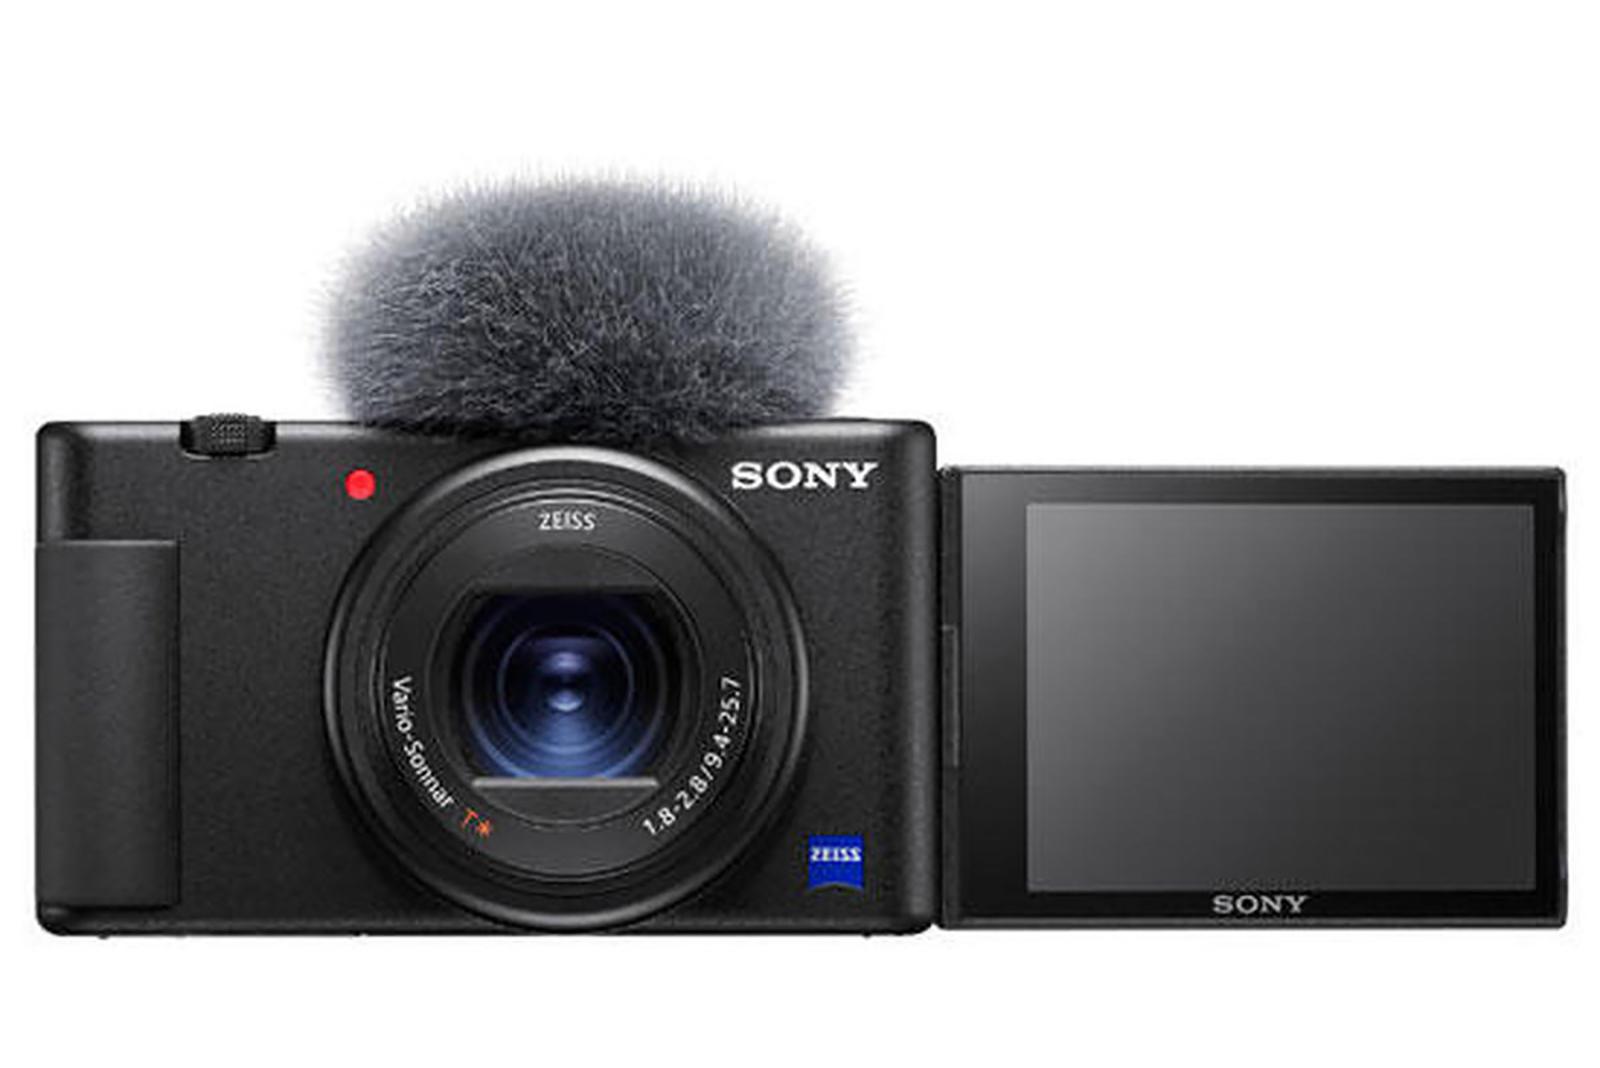 sony-zv1-camera-image.jpg